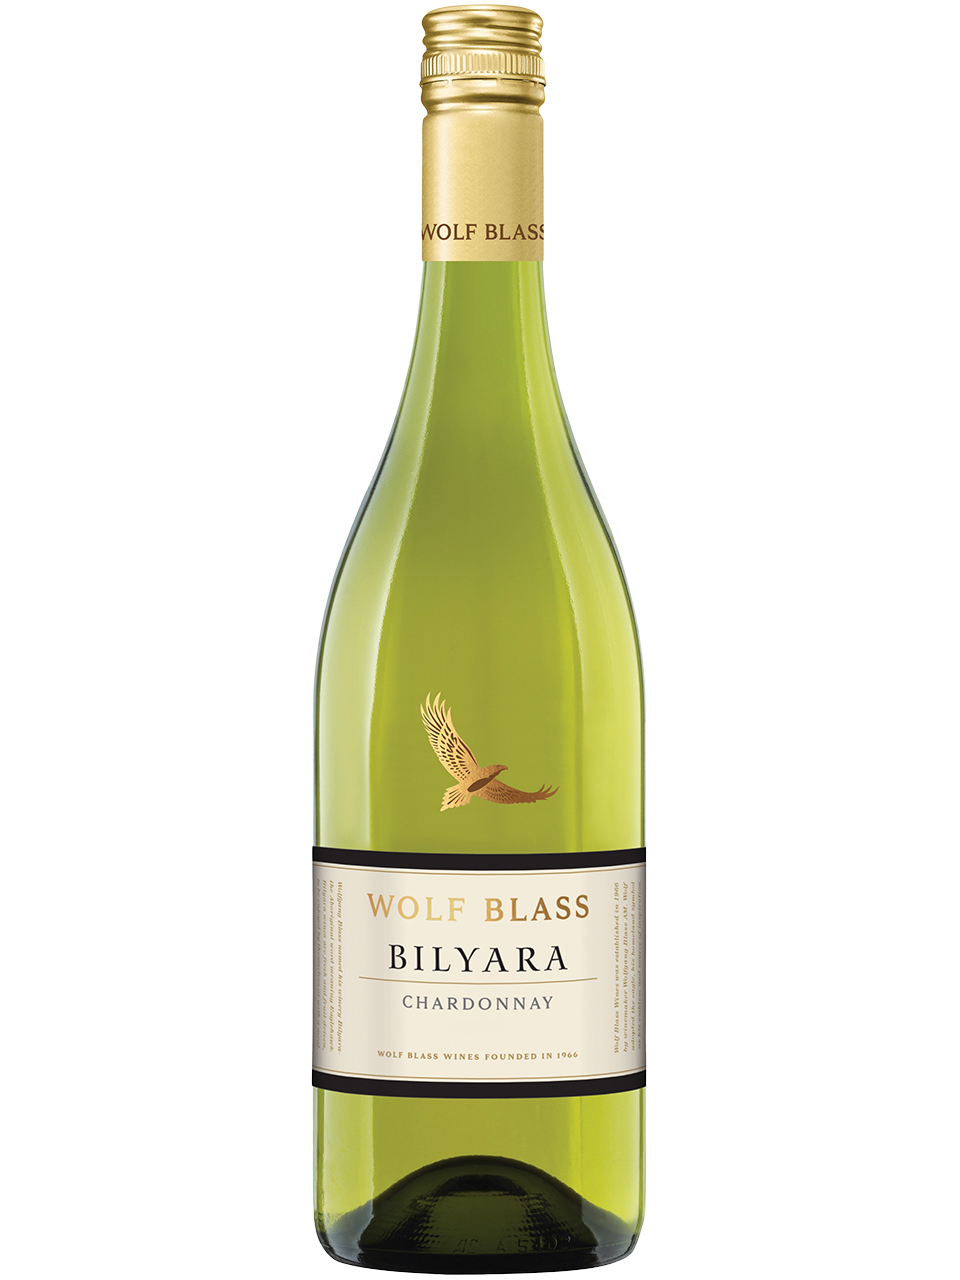 Wolf Blass Bilyara Chardonnay